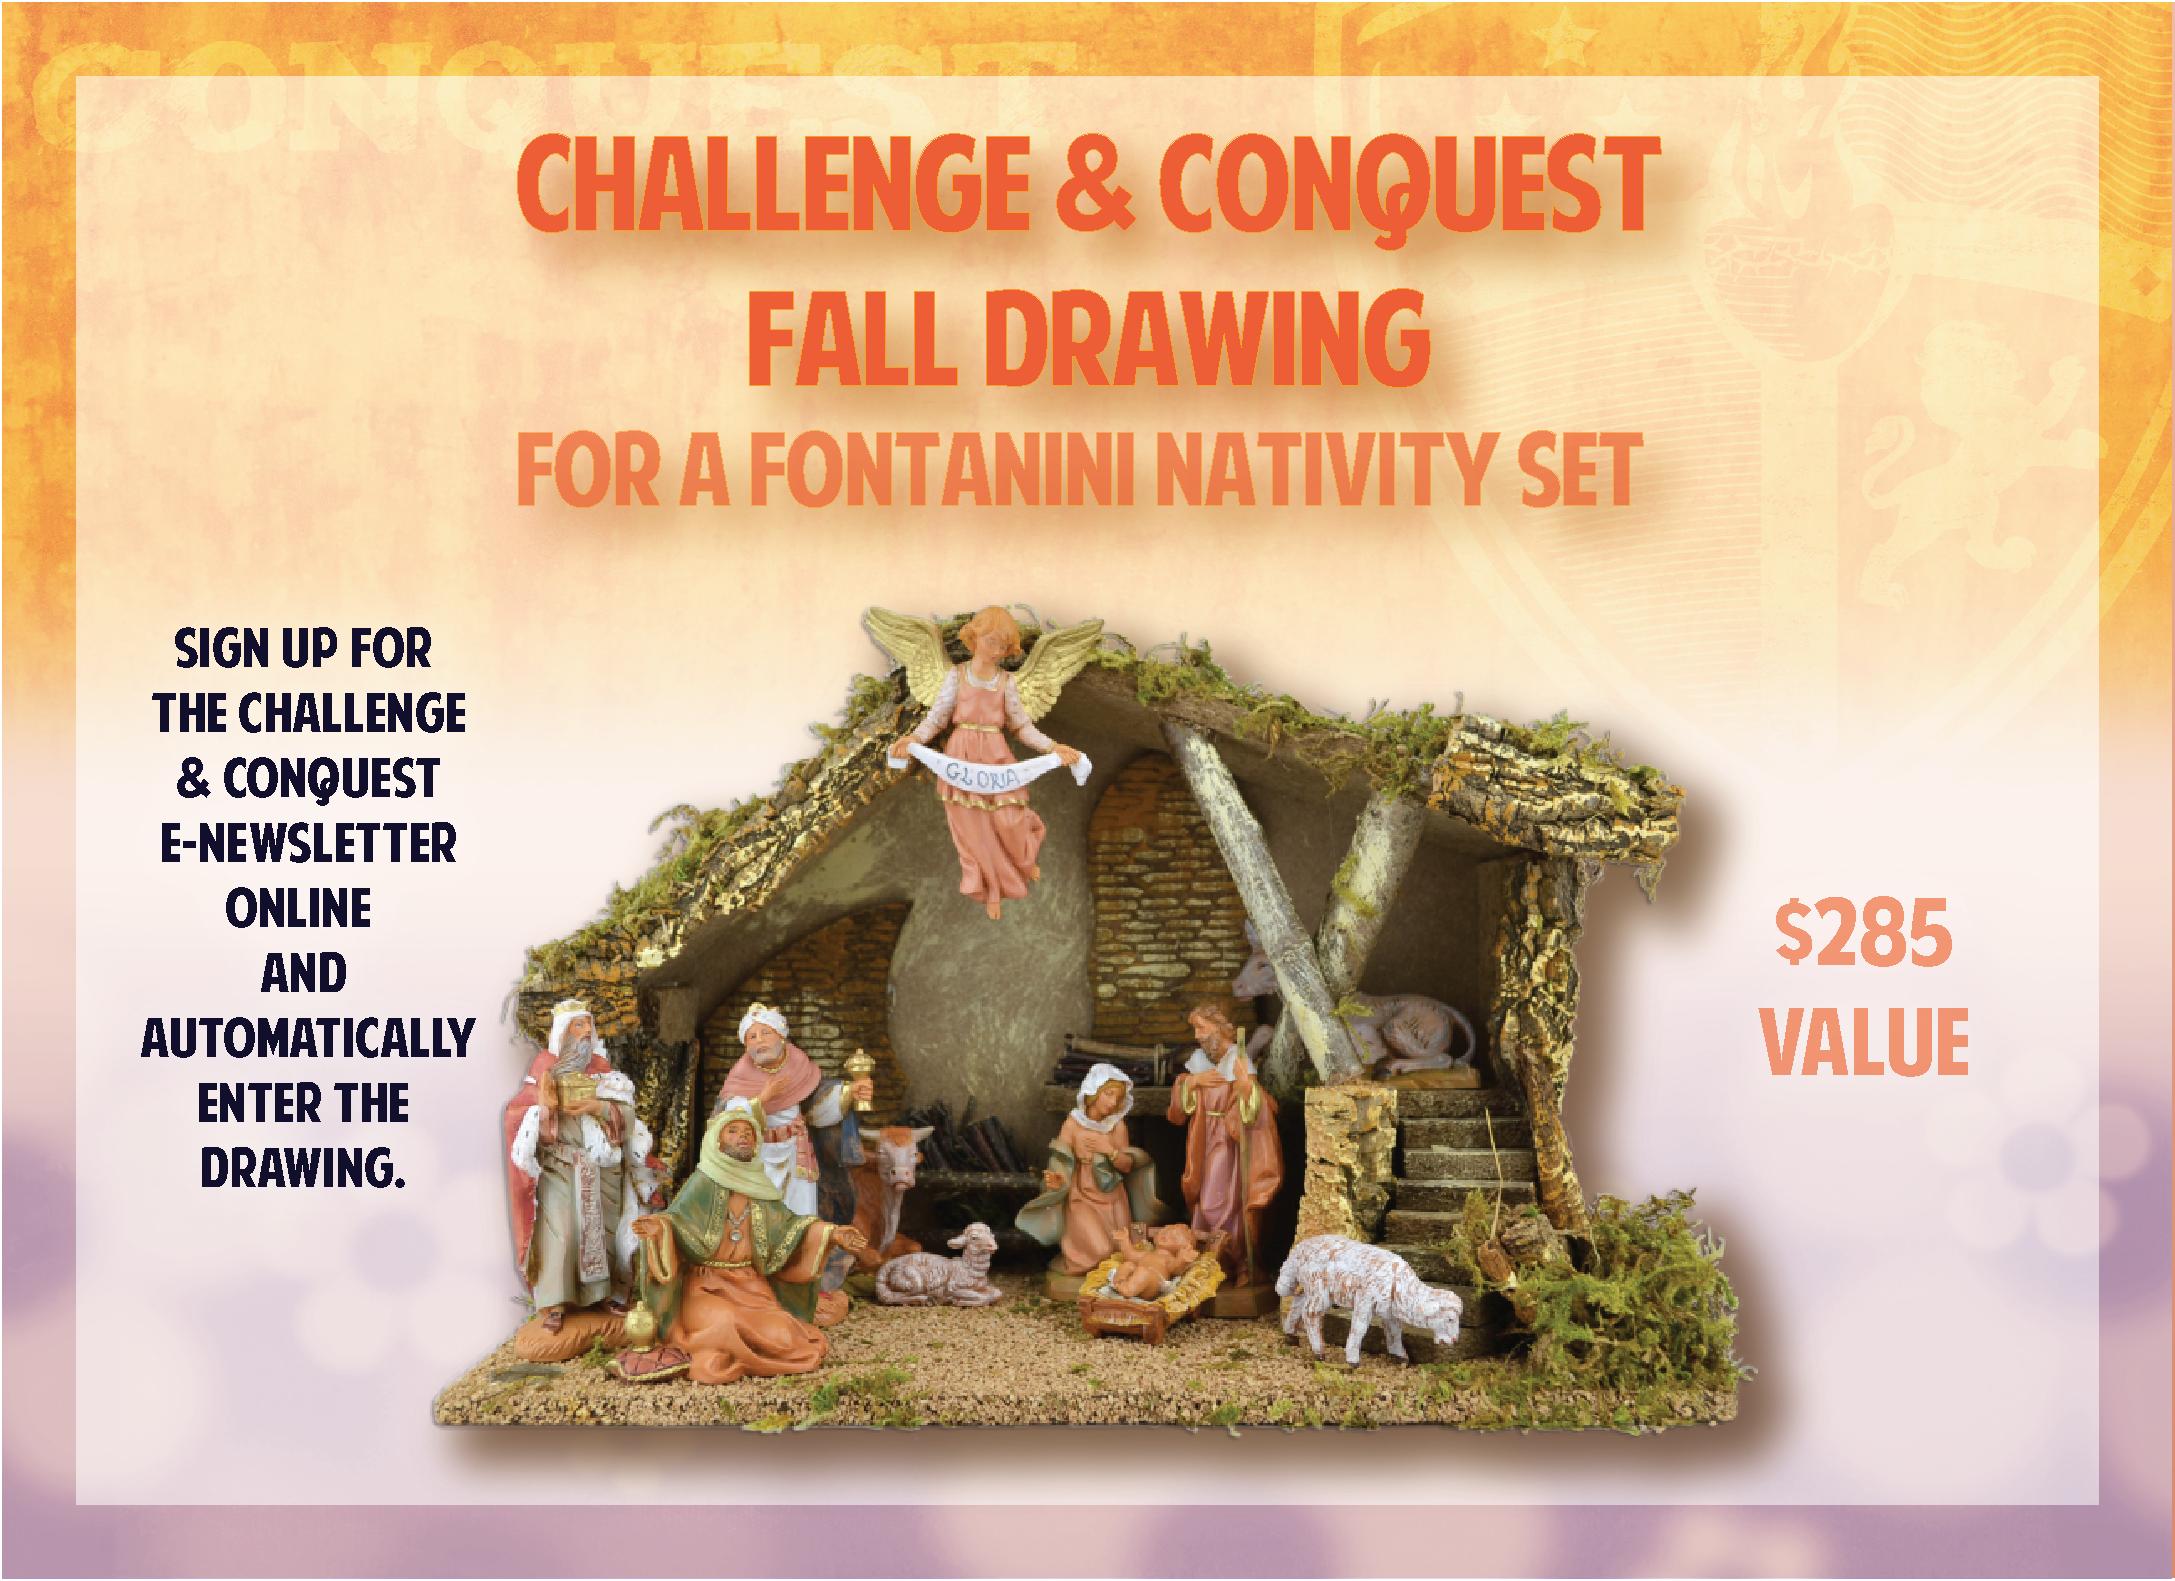 Nativity Raffle Websites